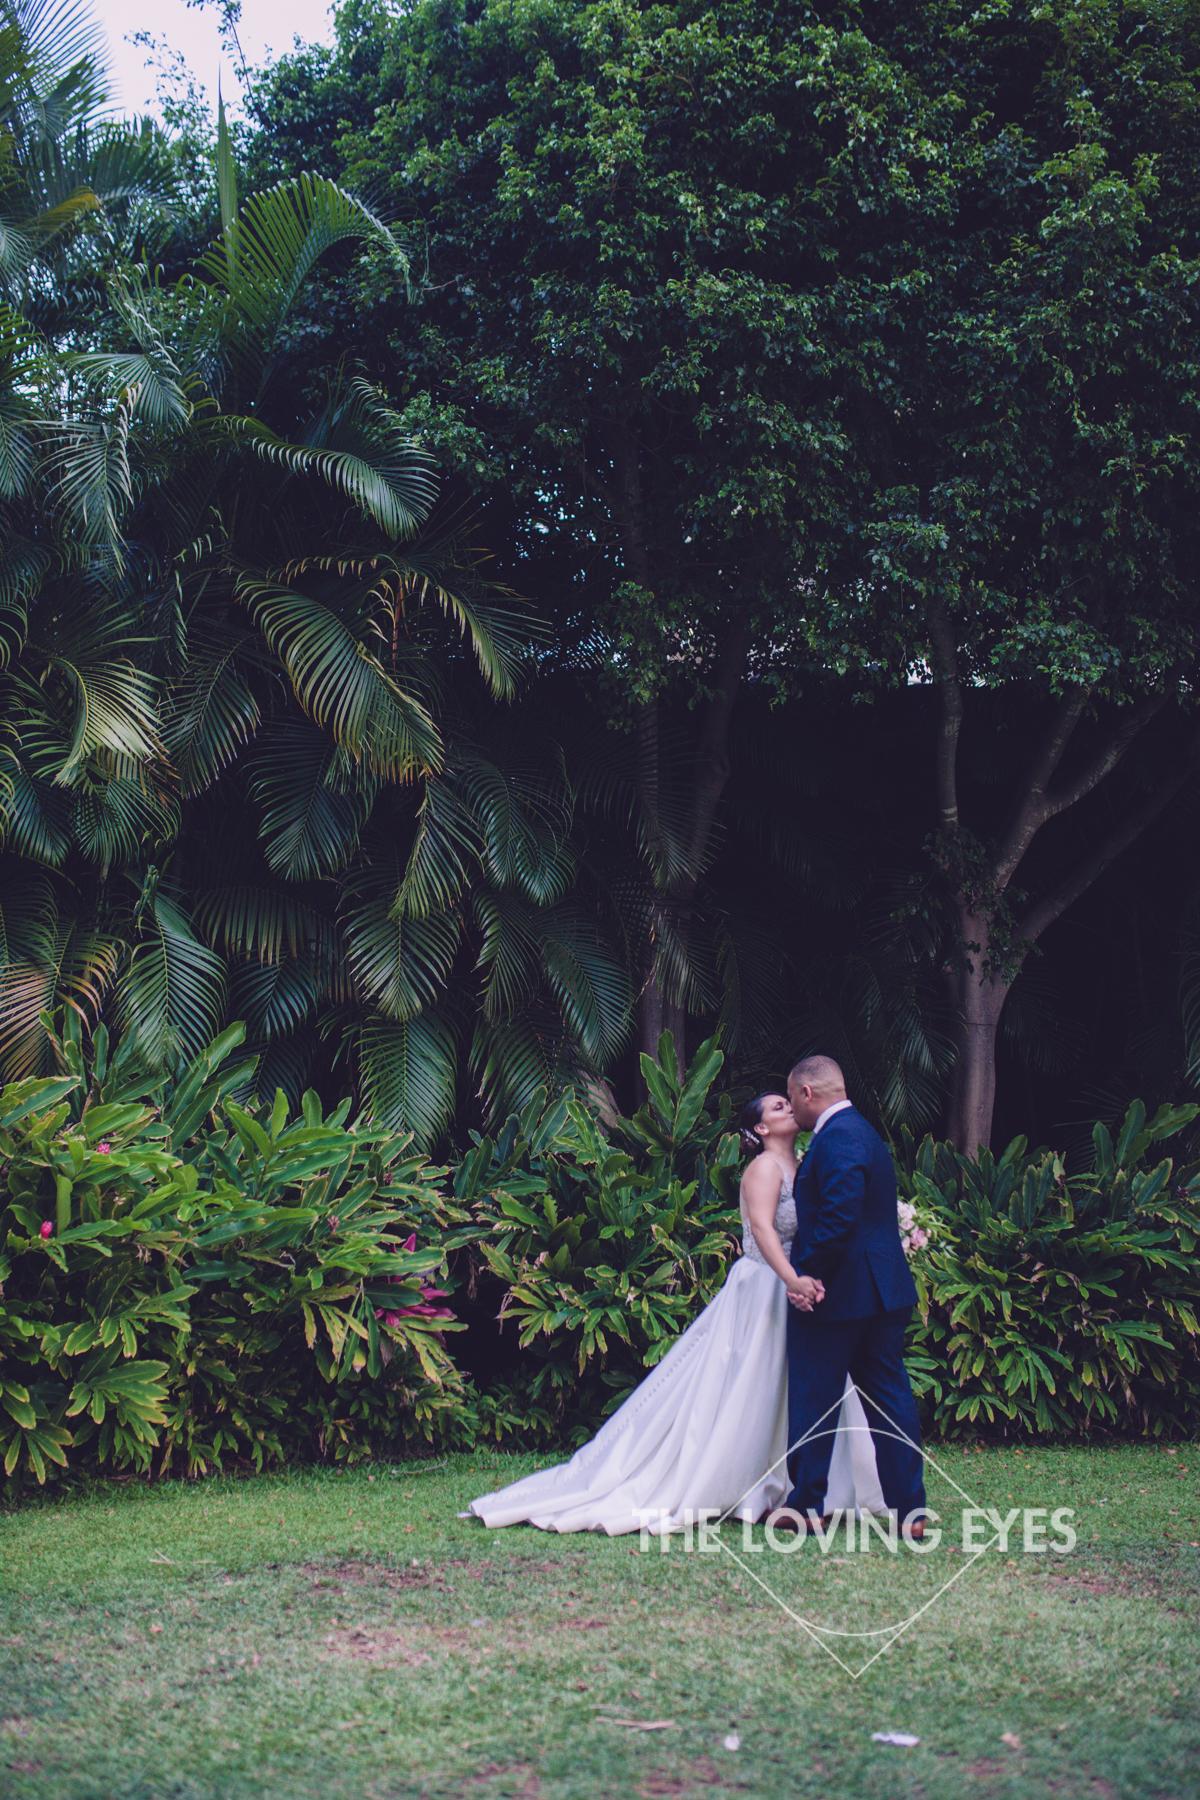 Bride and Groom on wedding day at Hilton Hawaiian Village Rainbow Suite in Waikiki